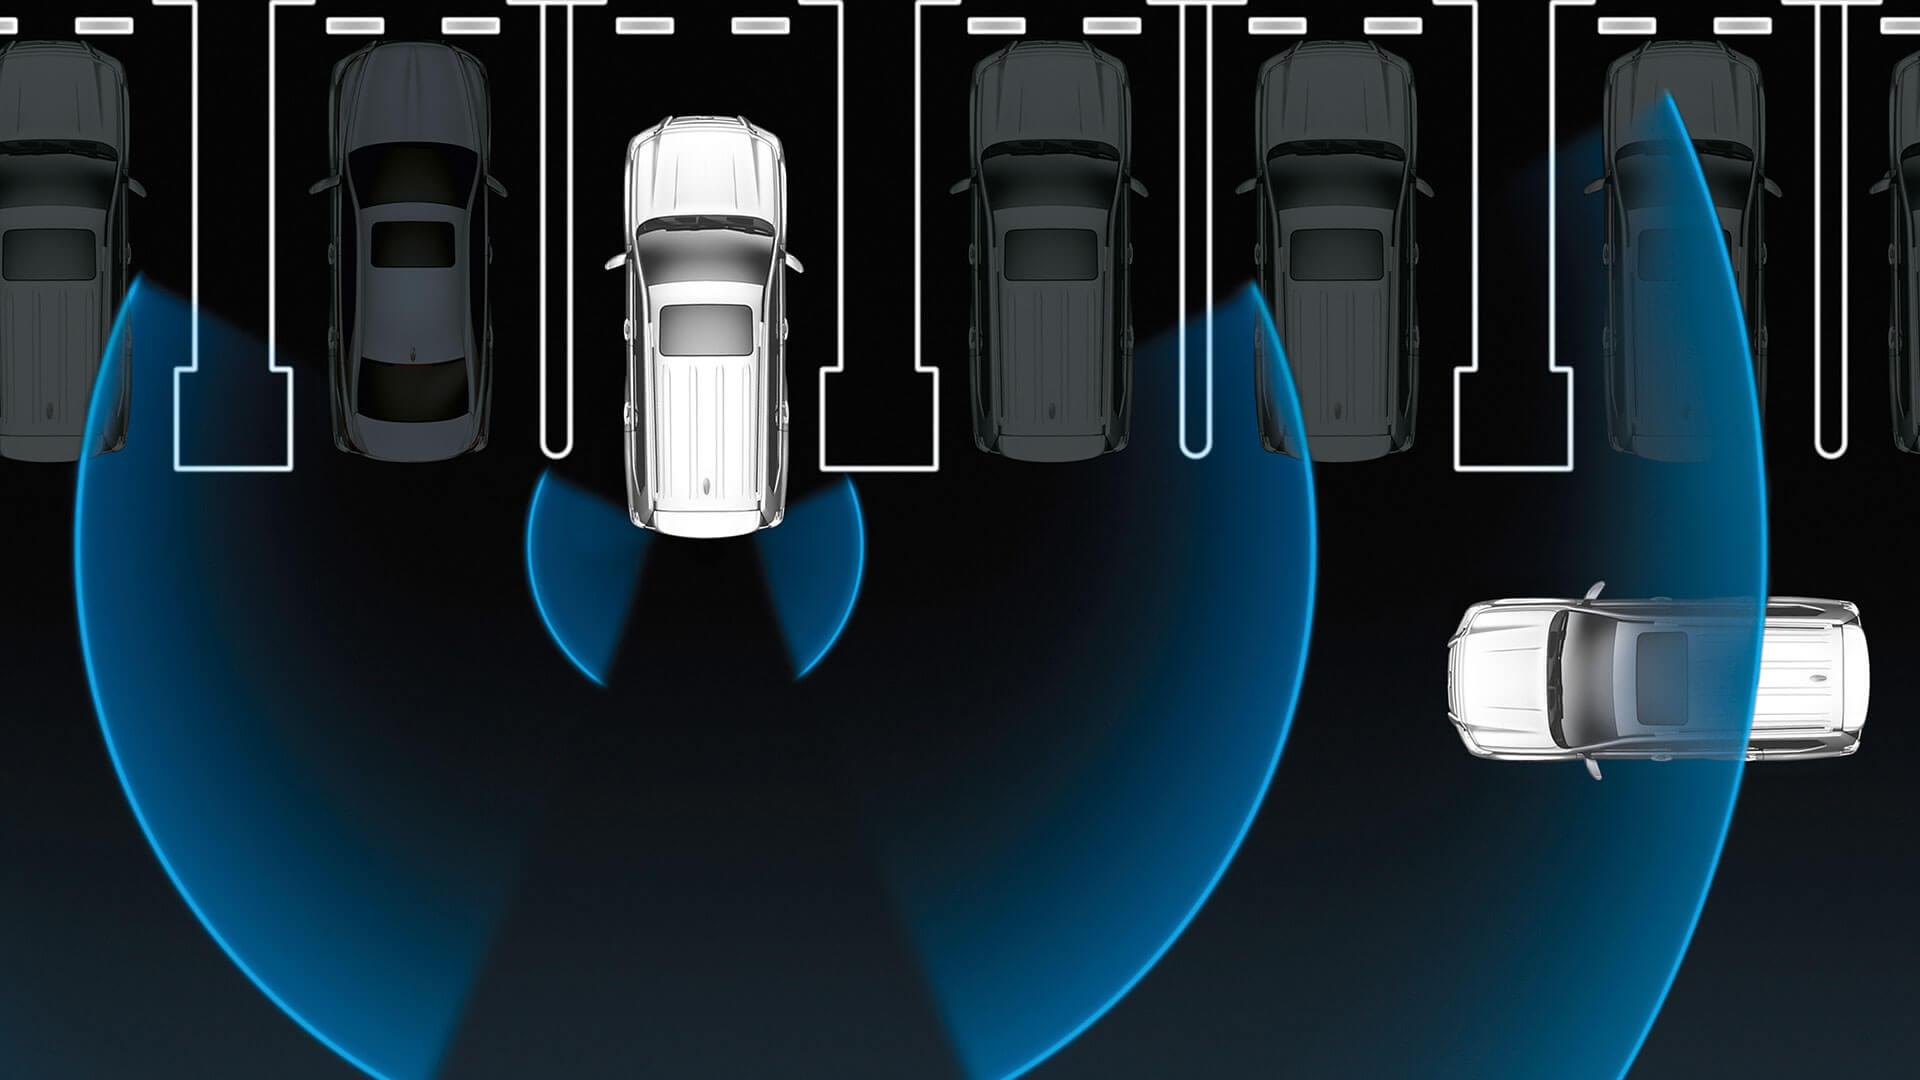 2017 lexus gx 460 features rear cross traffic alert